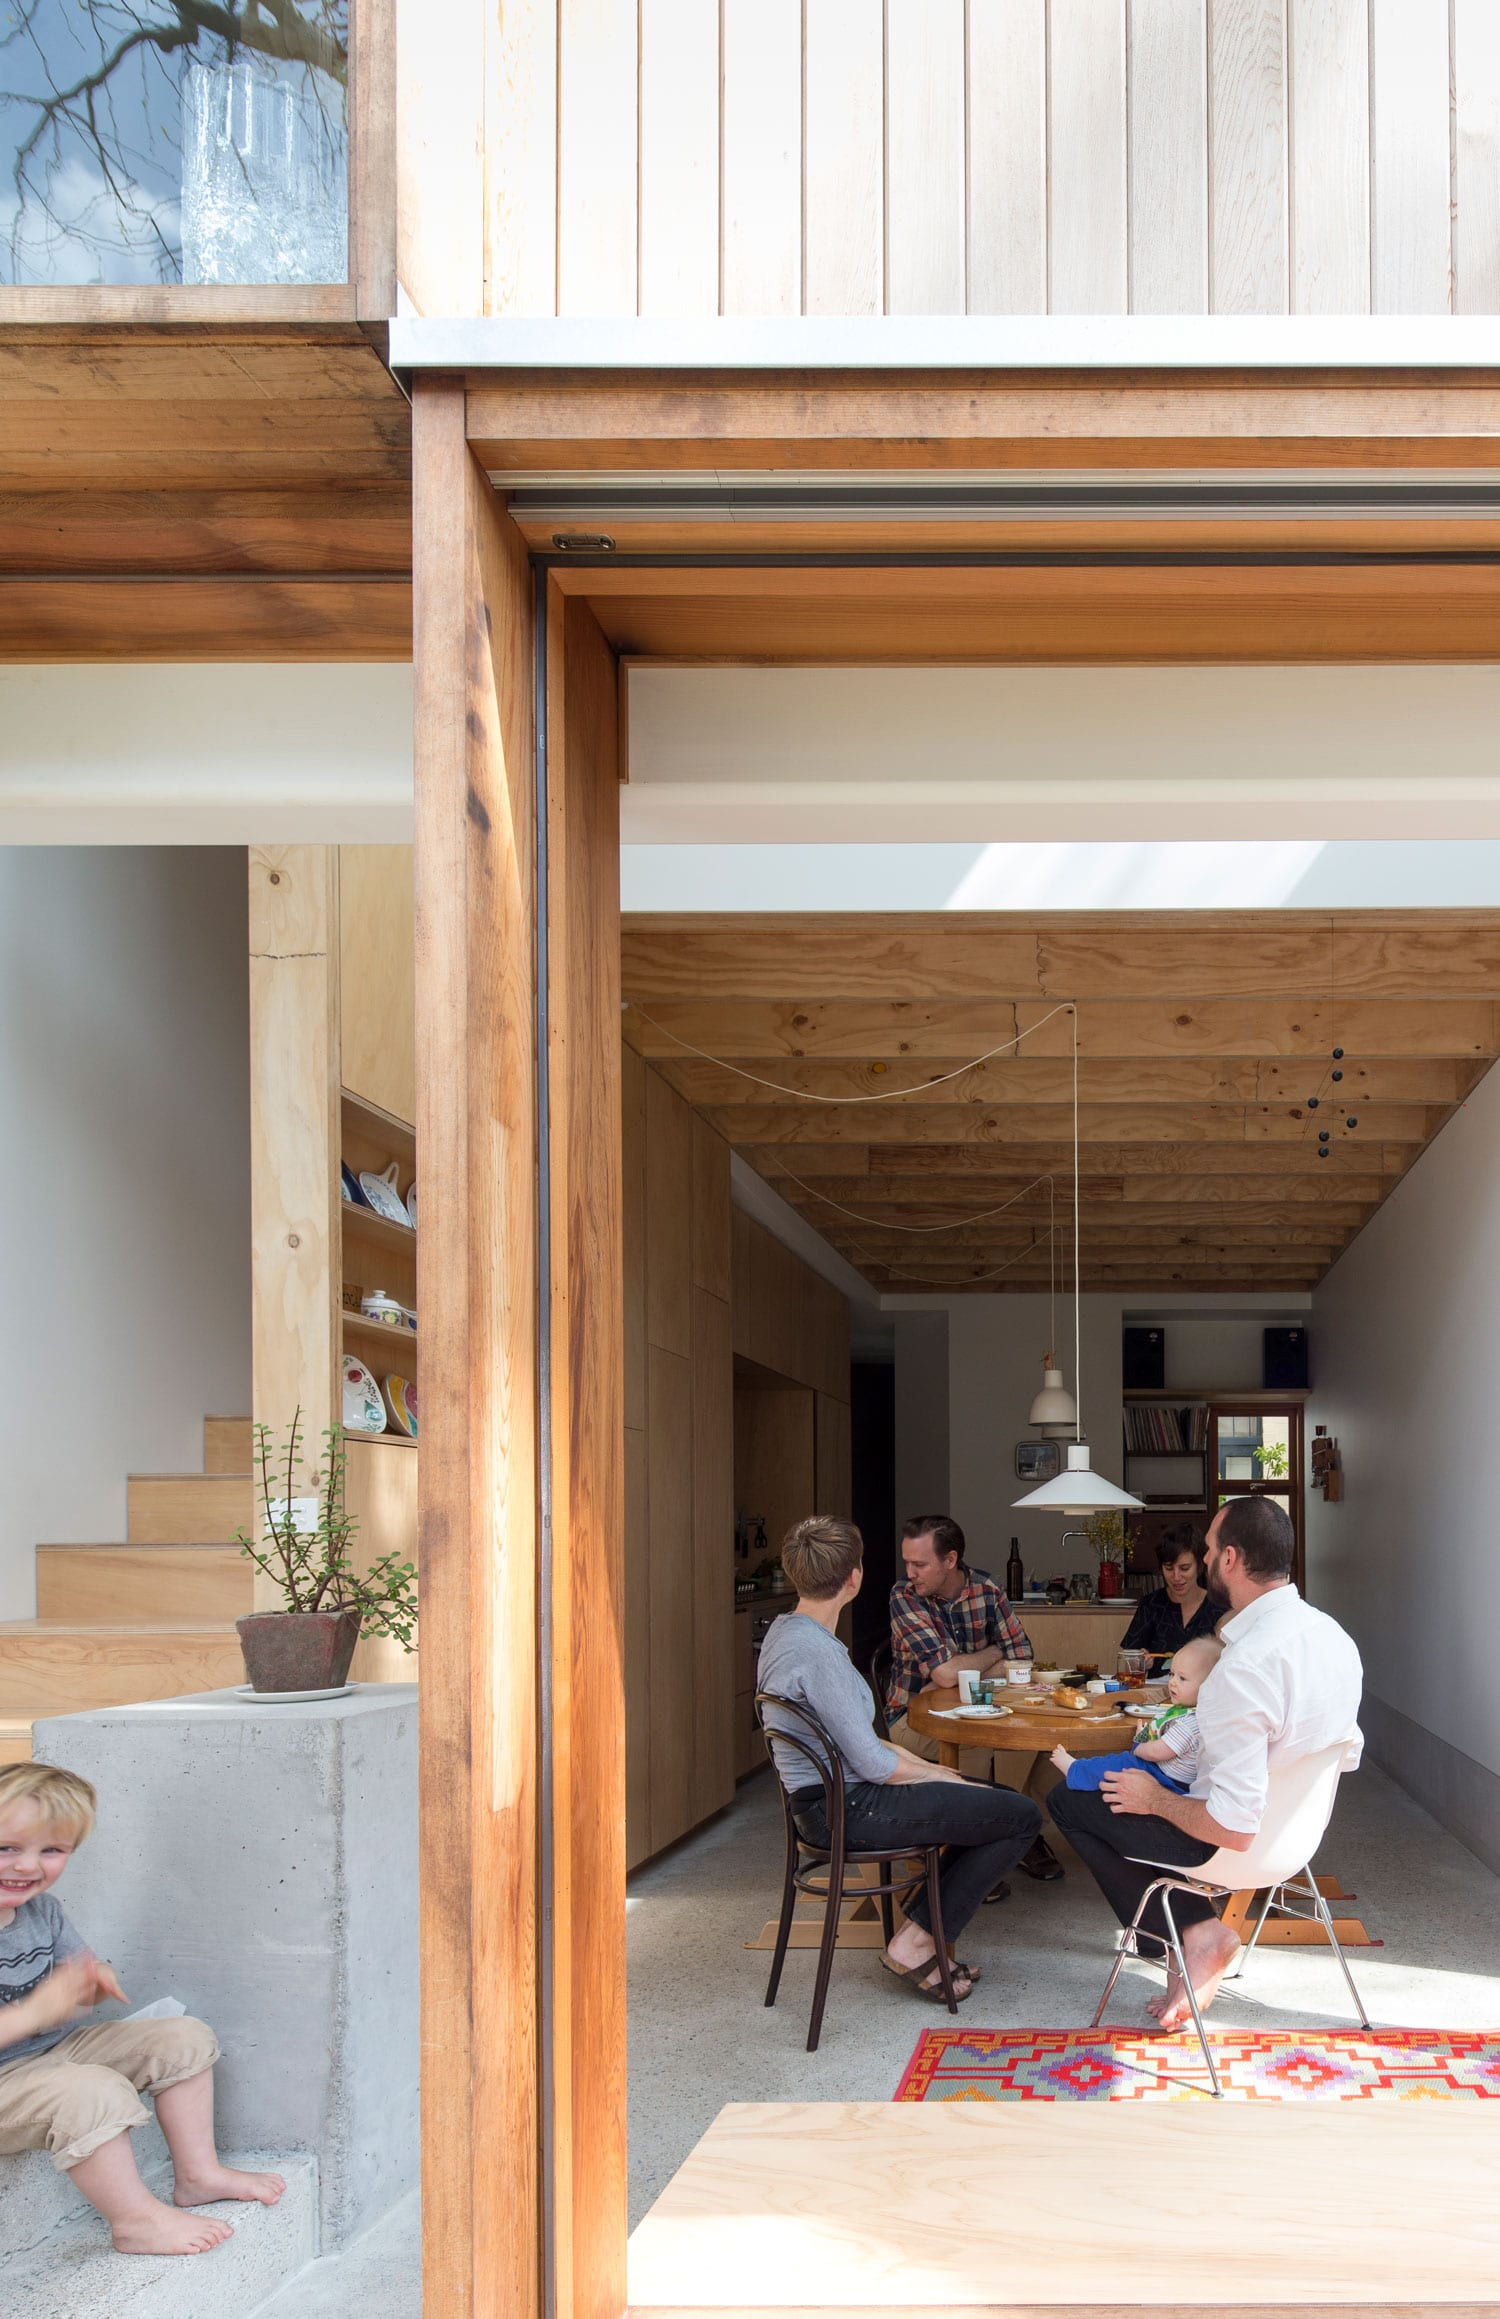 3x2 House, Sydney by panovscott   Yellowtrace